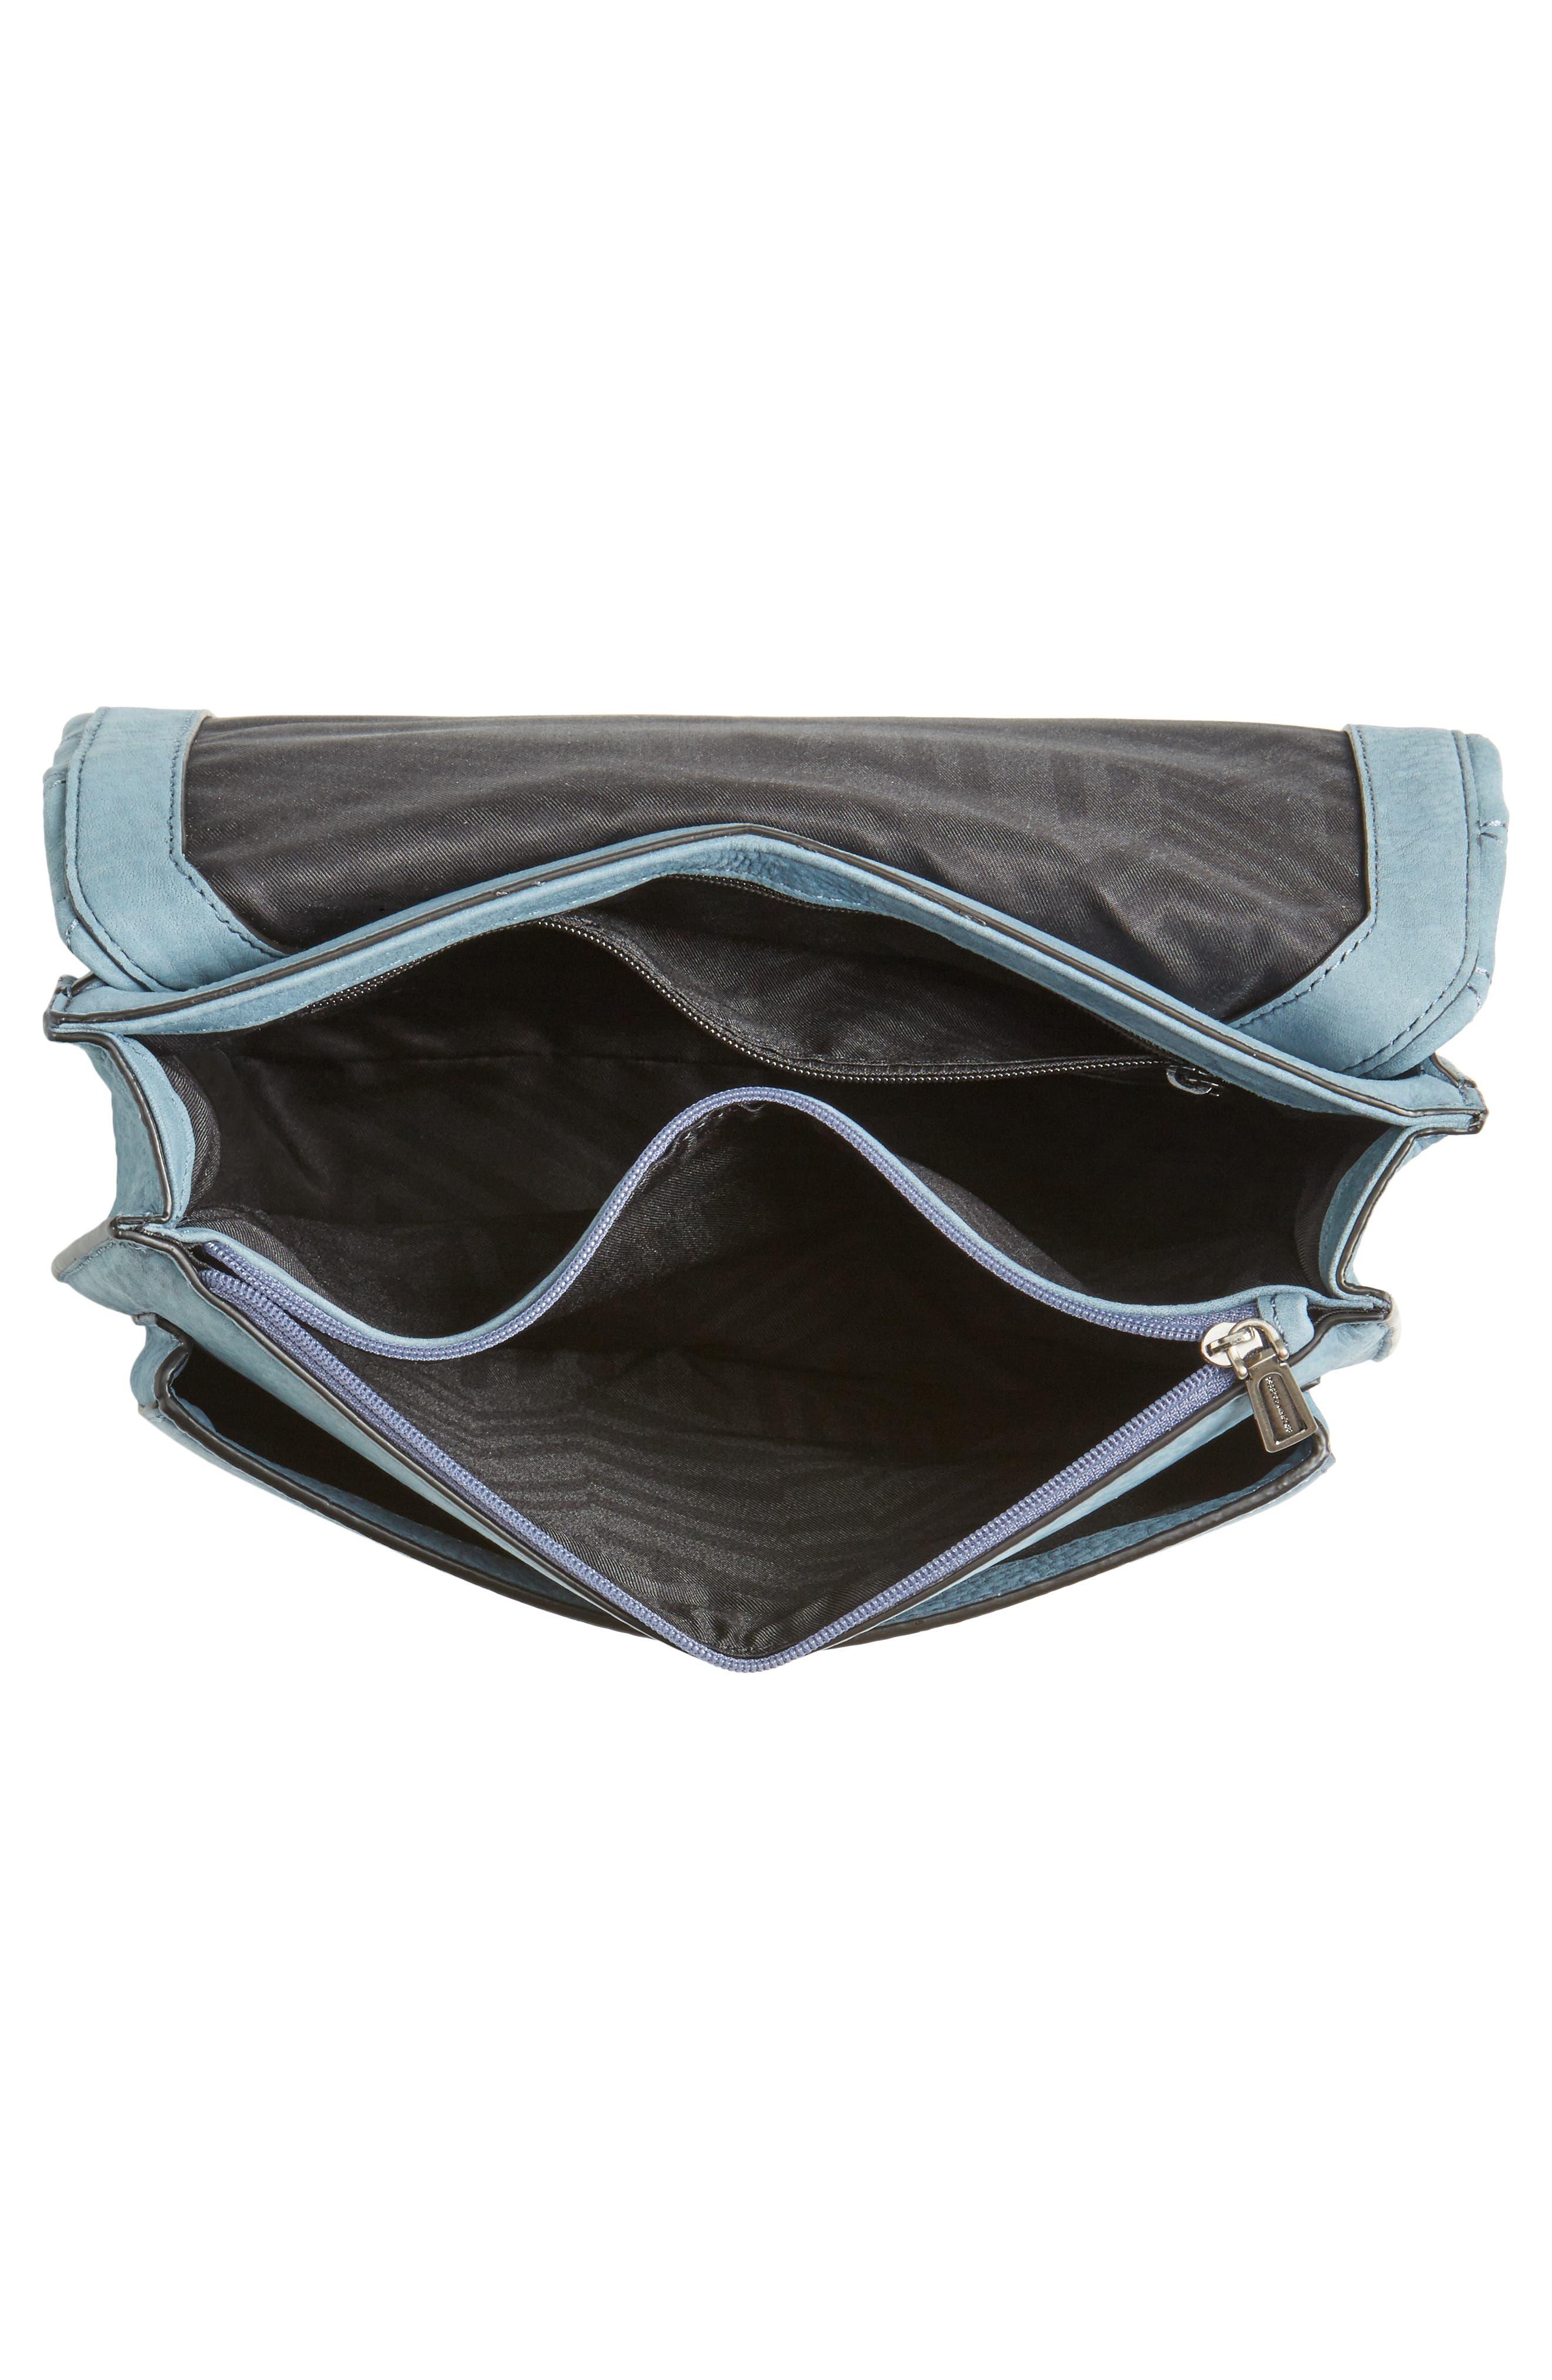 Medium Je T'aime Convertible Leather Crossbody Bag,                             Alternate thumbnail 35, color,